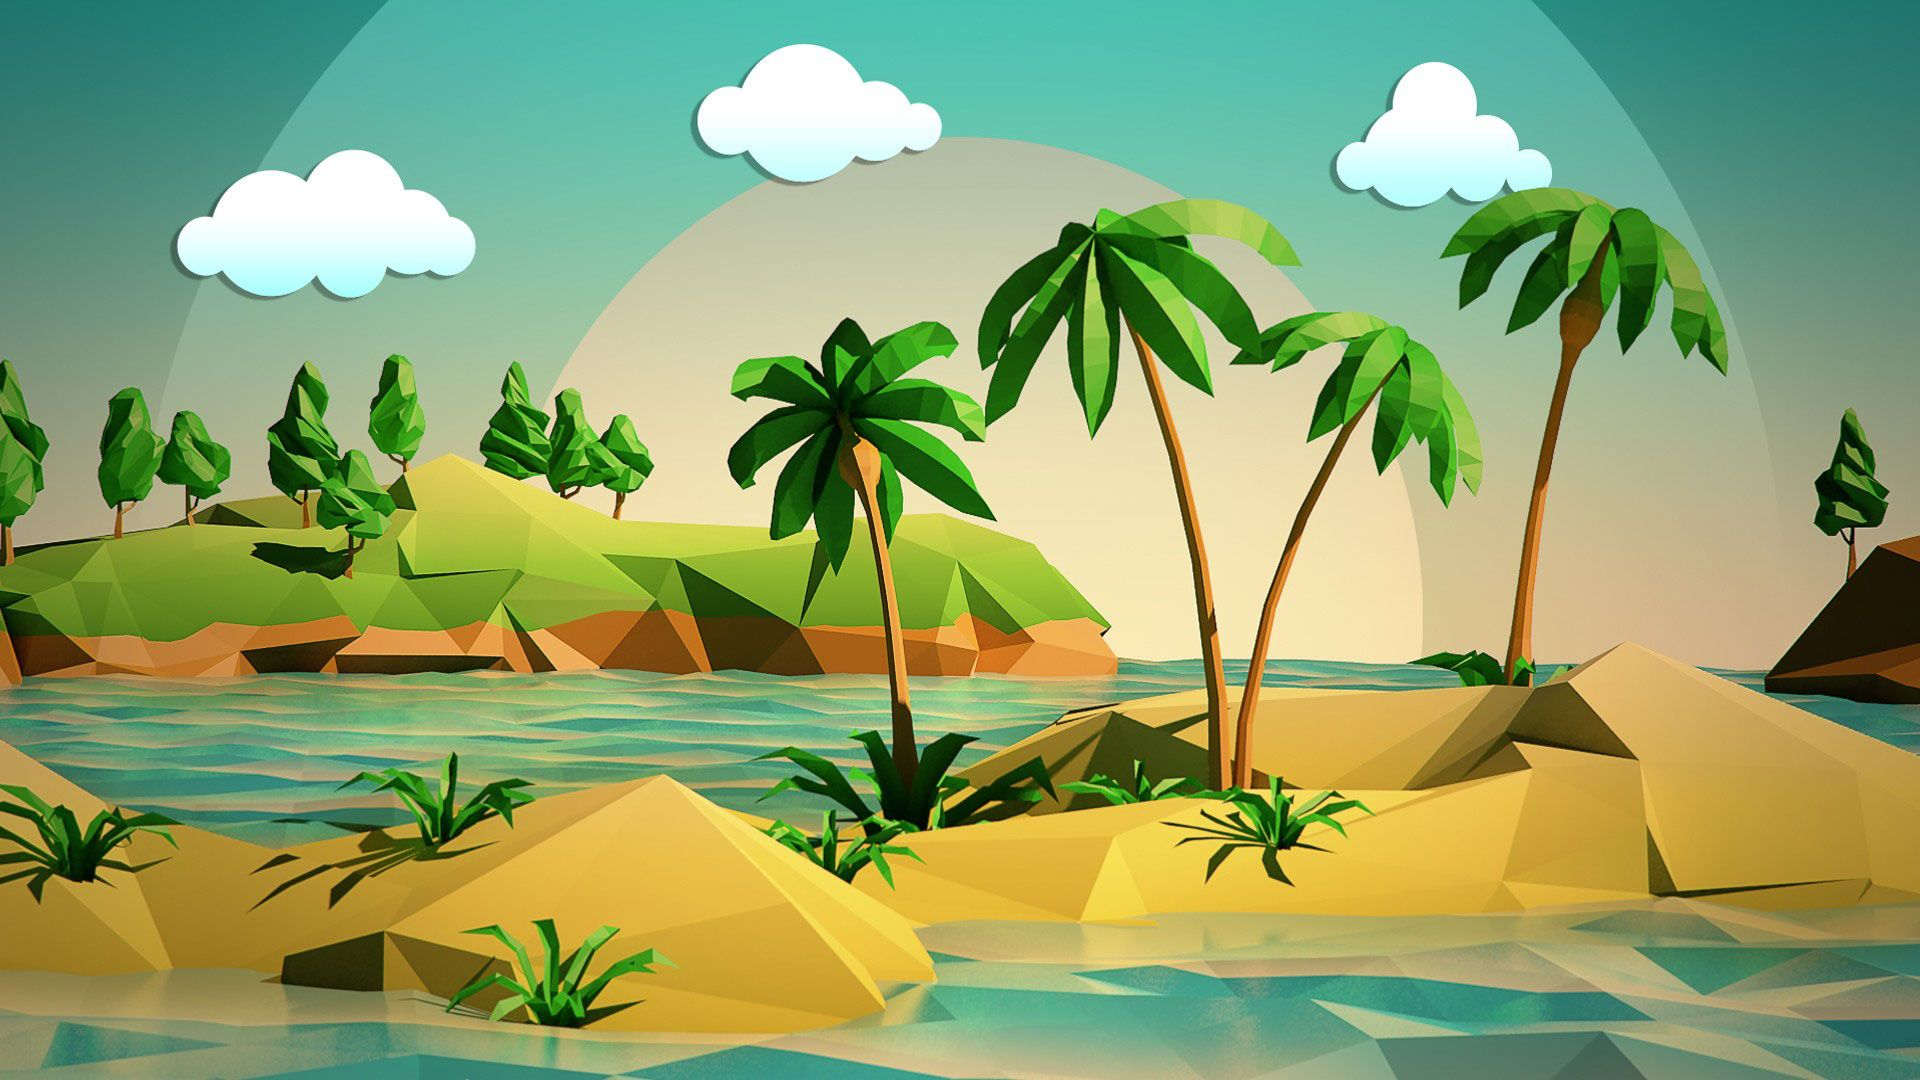 1000 Ideas About Hd Images On Pinterest: Ideas About Nature Desktop Wallpaper On Pinterest 1600